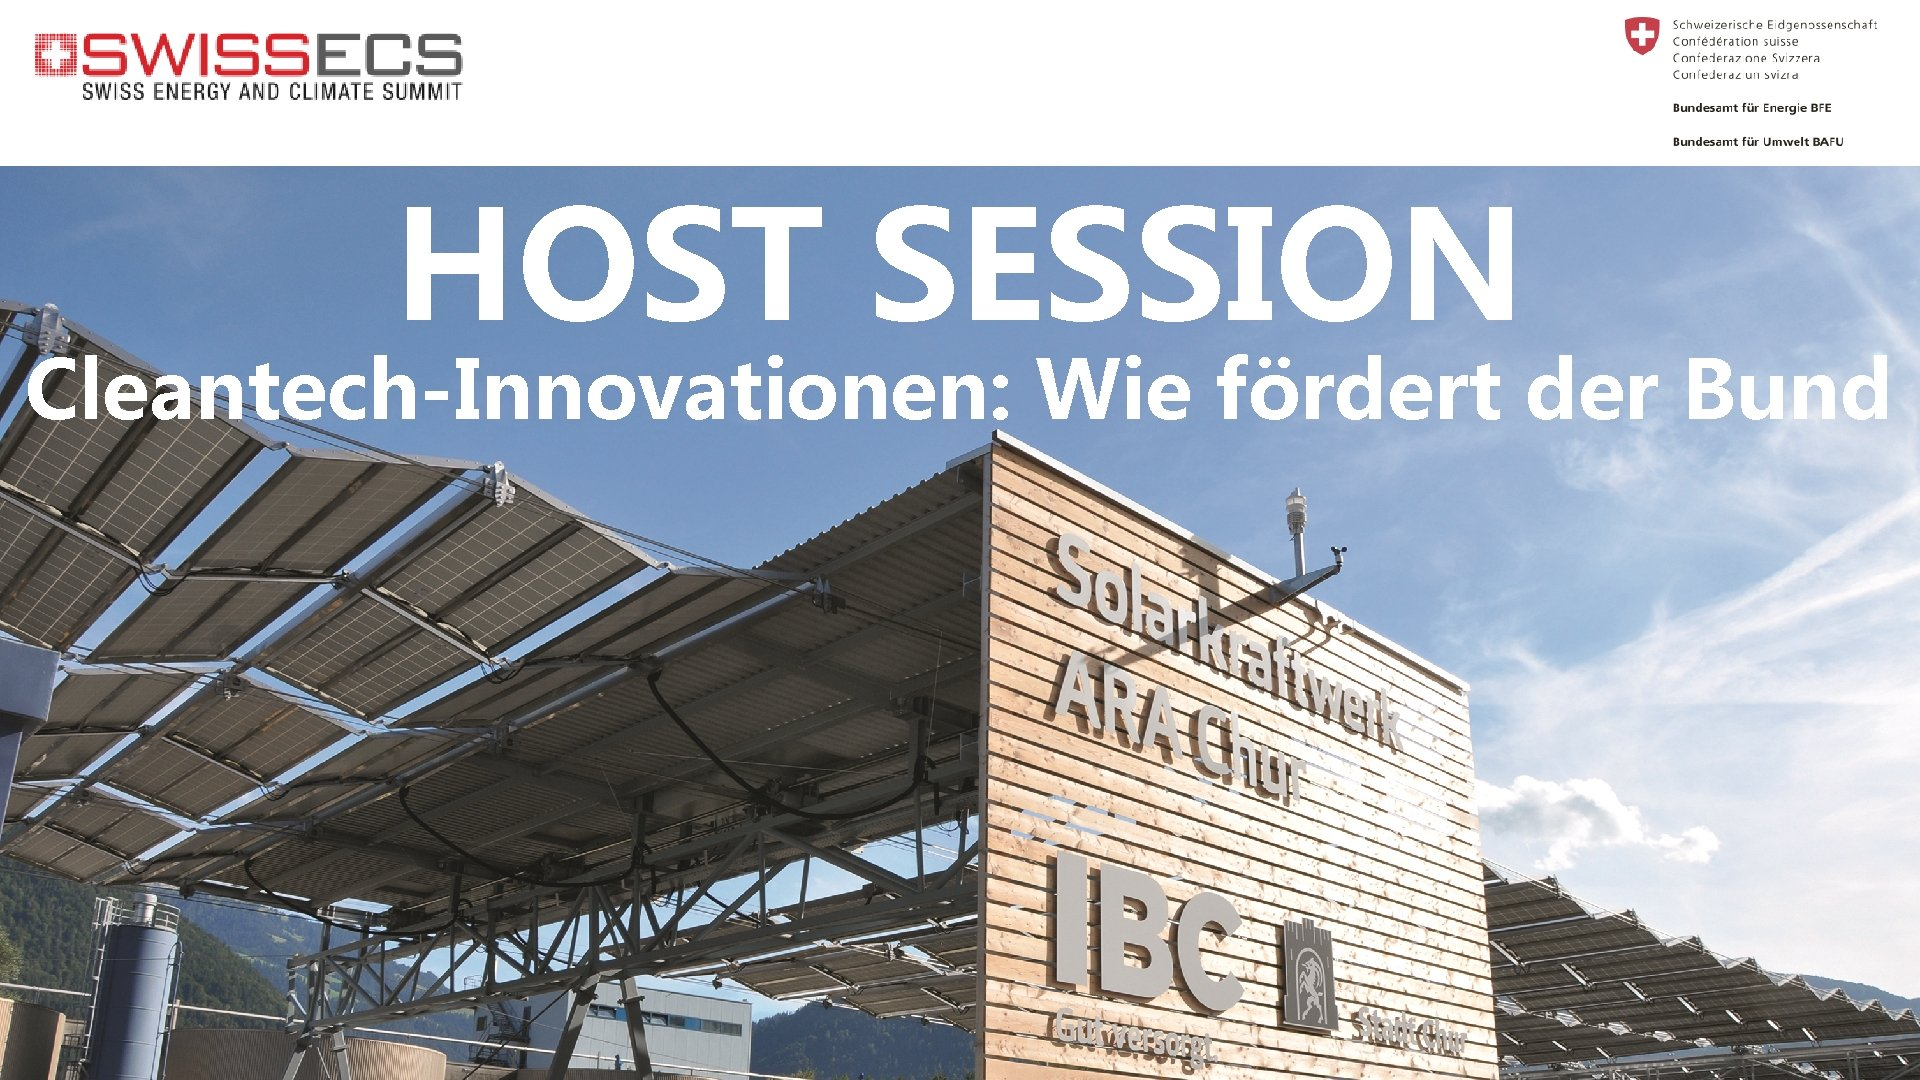 HOST SESSION Cleantech-Innovationen: Wie fördert der Bund